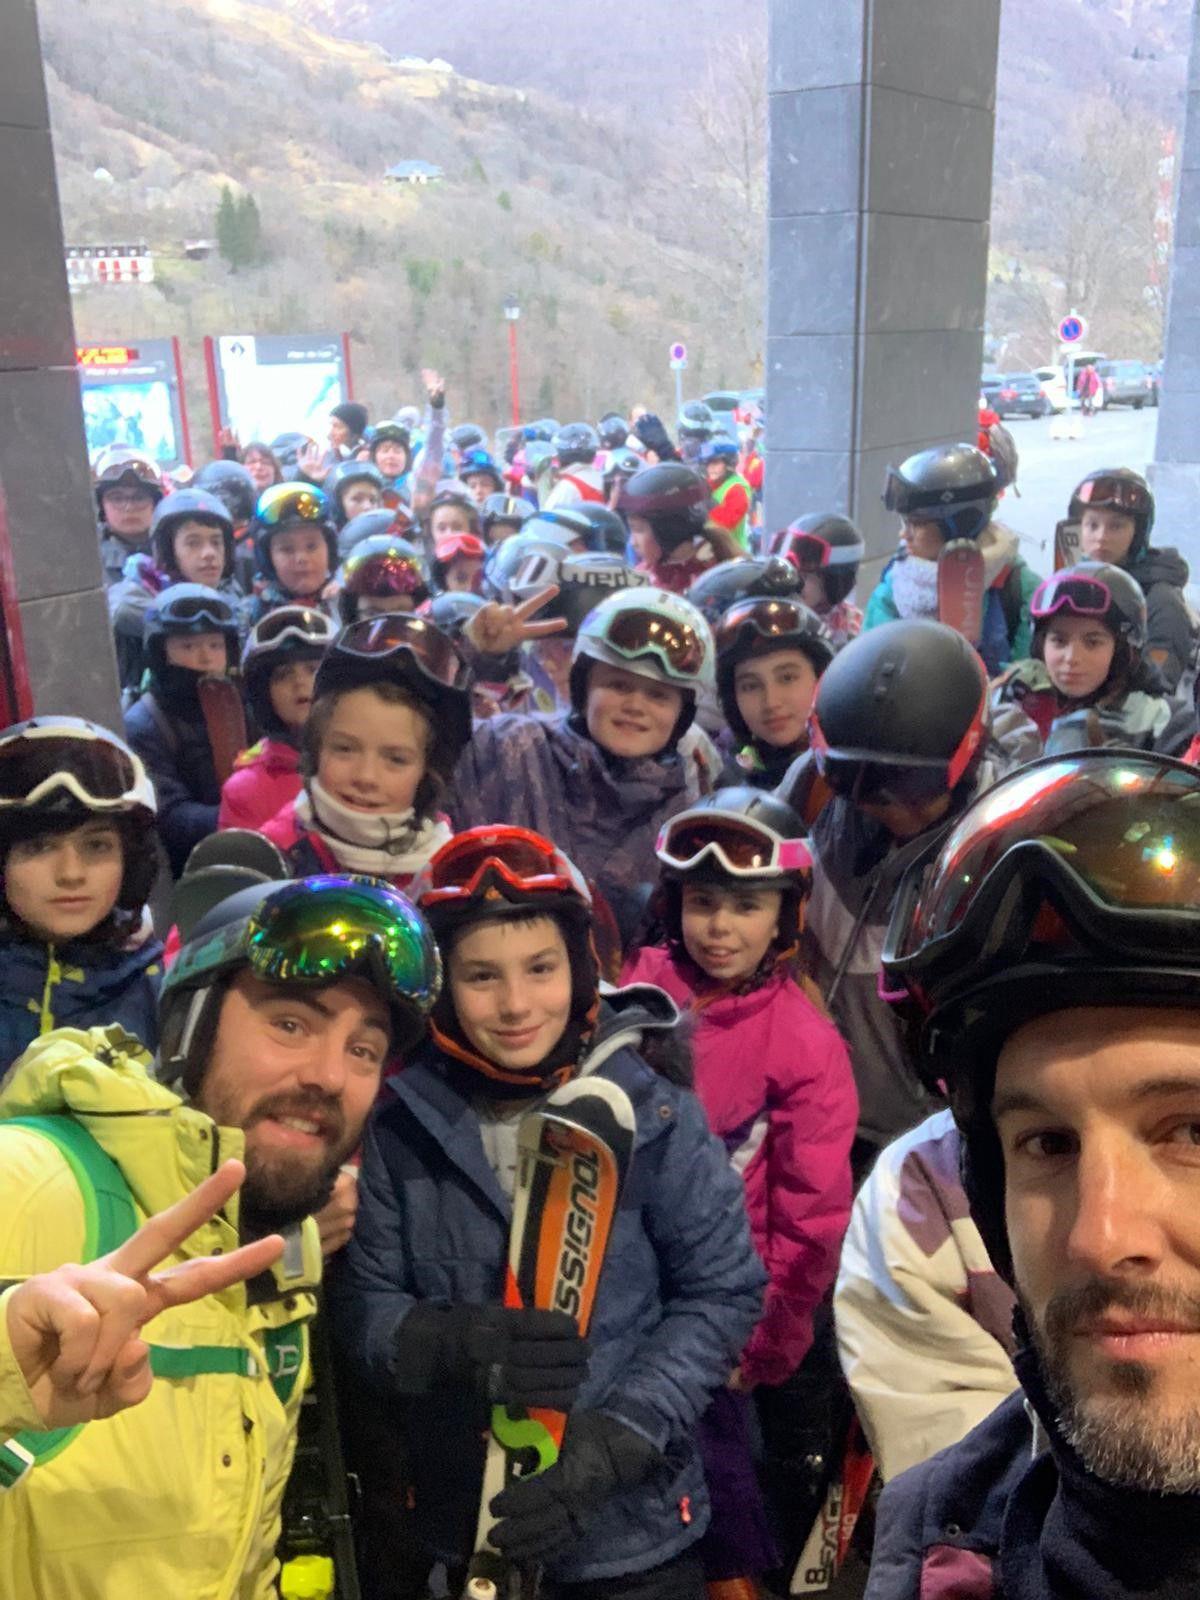 Séjour au ski - mercredi